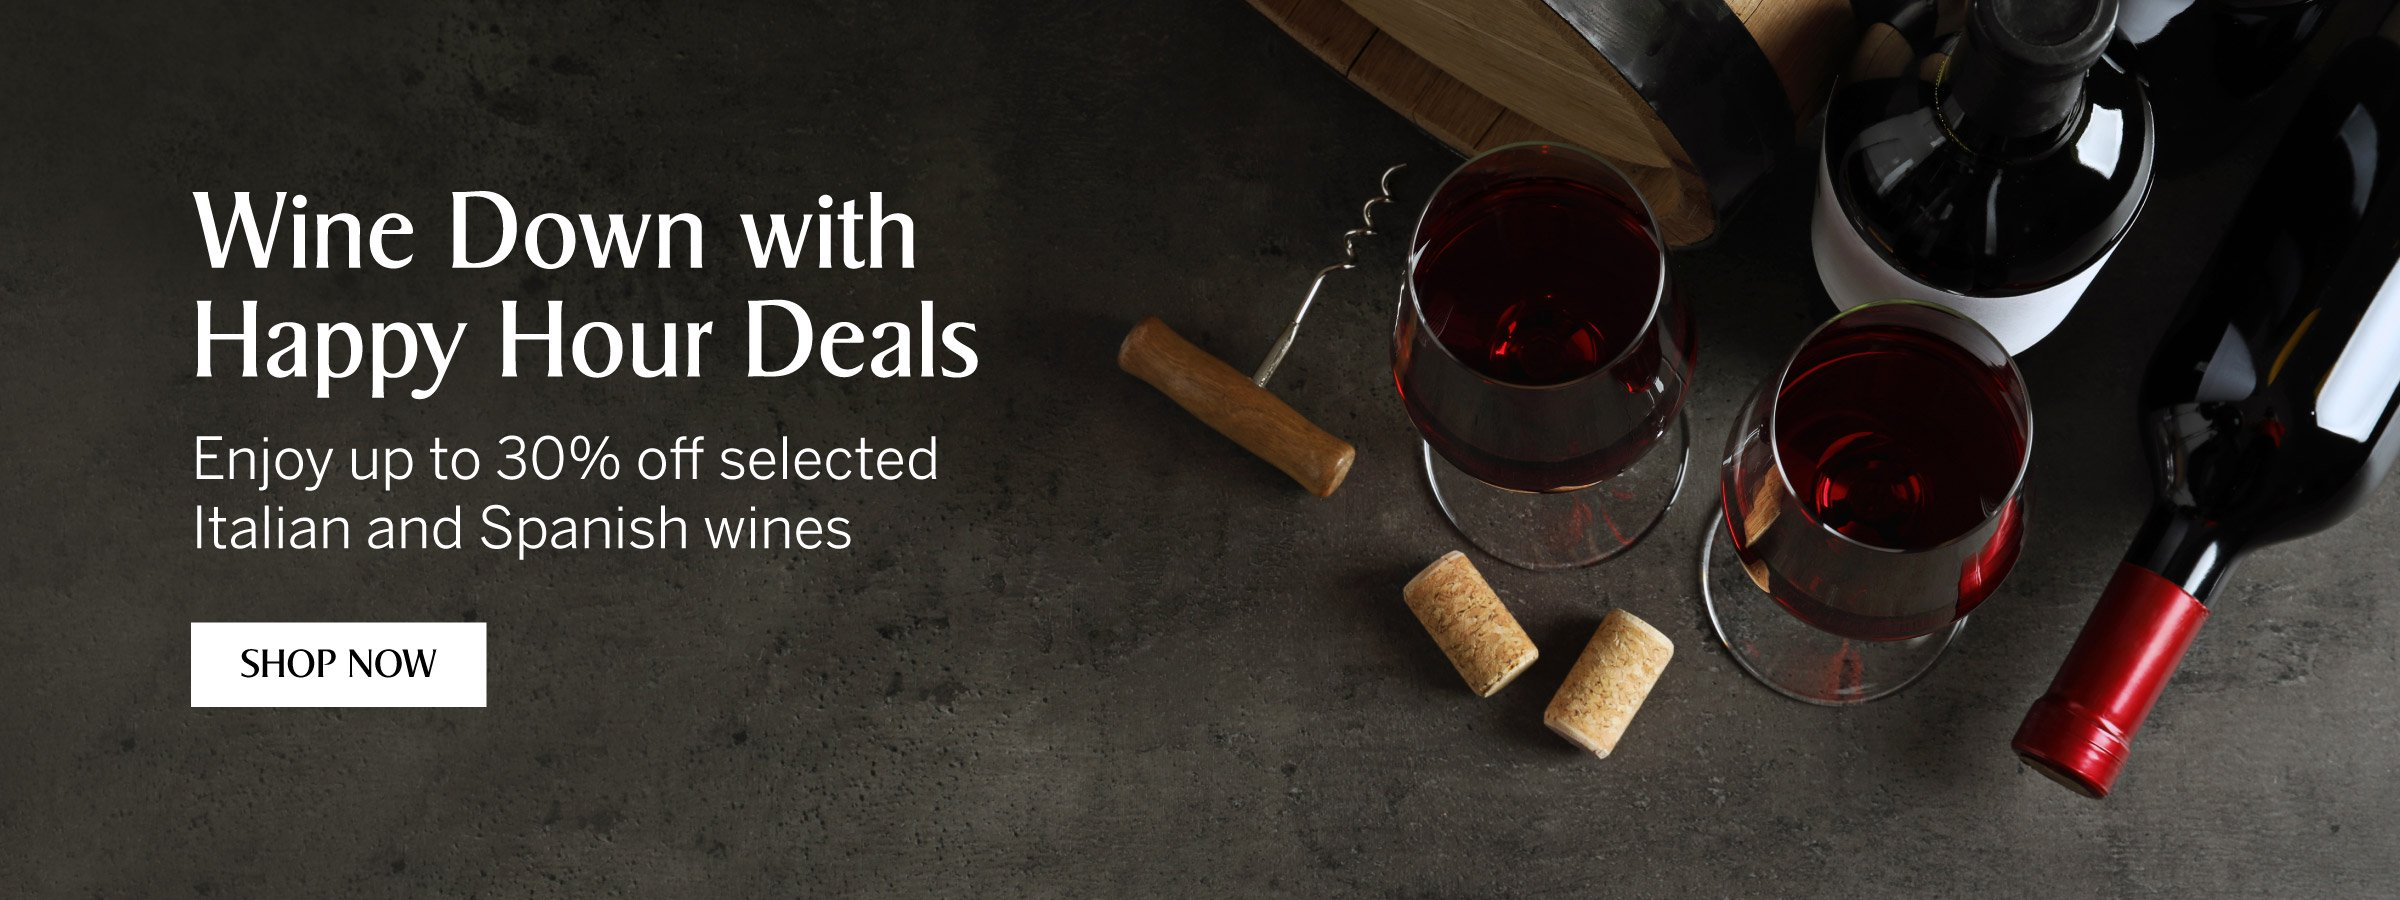 Enjoy up to 30% off Italian & Spanish wines